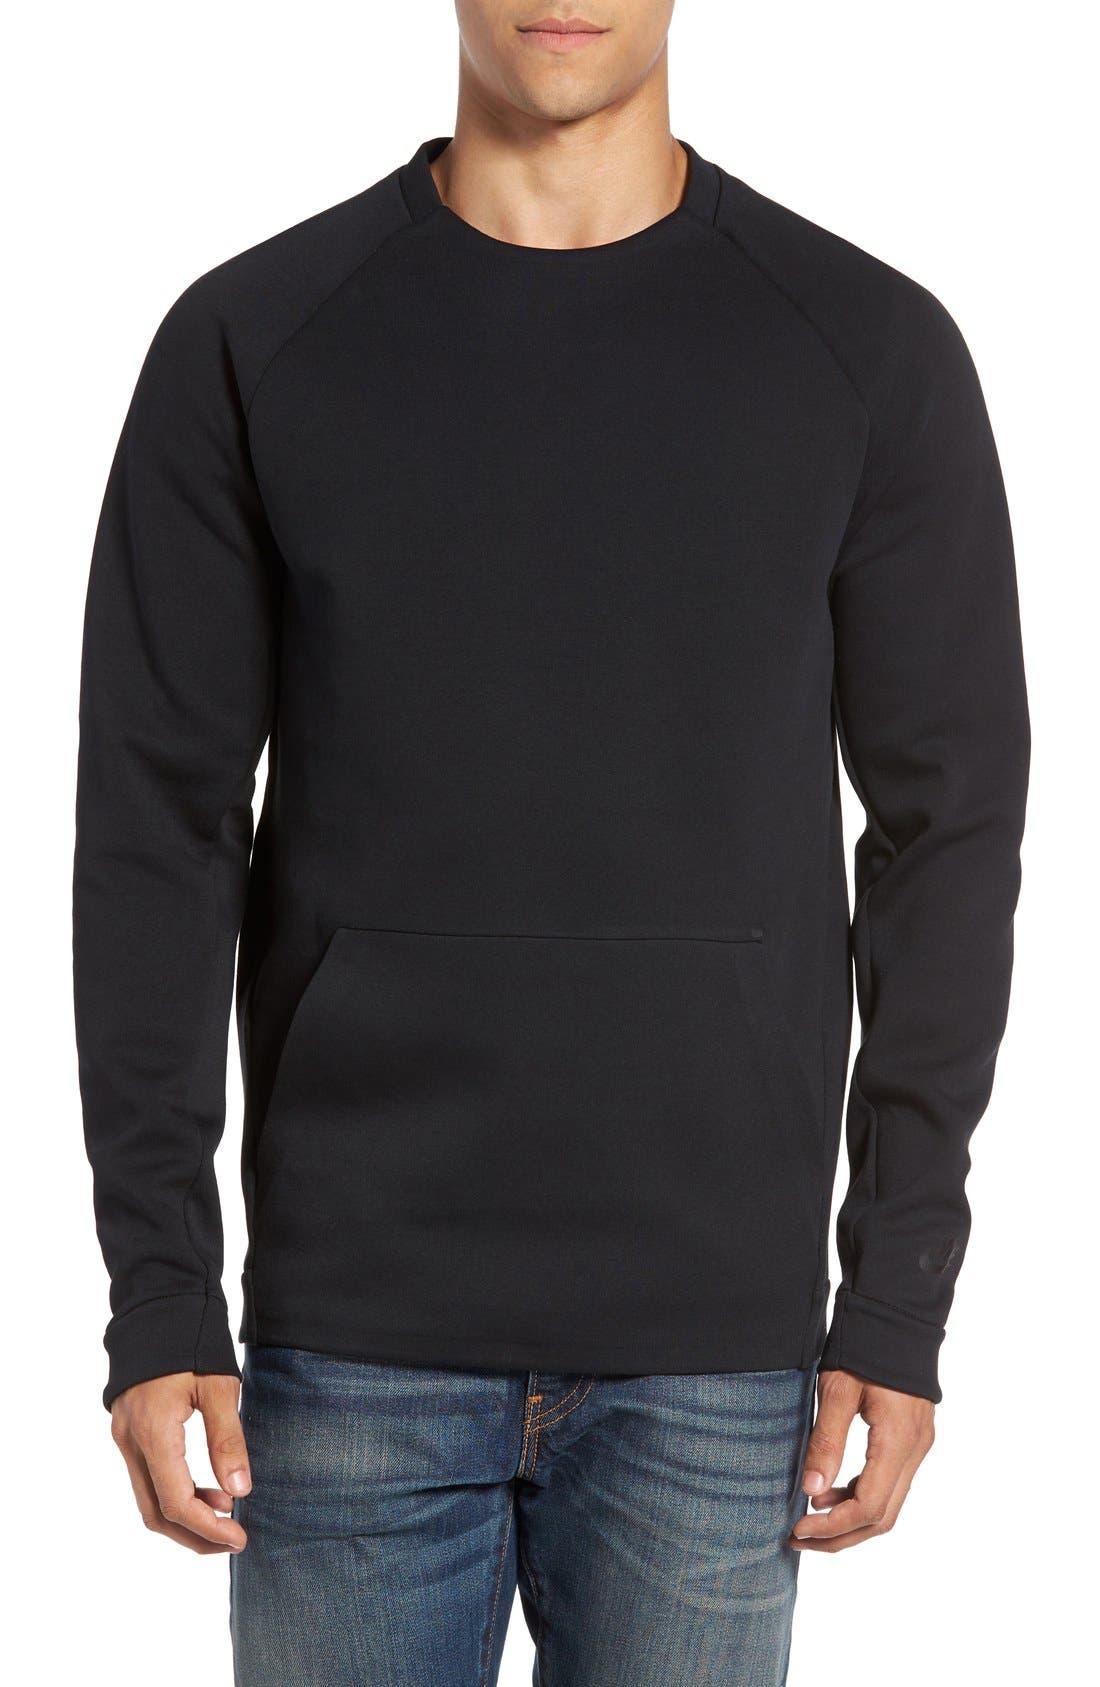 Main Image - Nike 'NSW Tech Fleece' Raglan Pullover